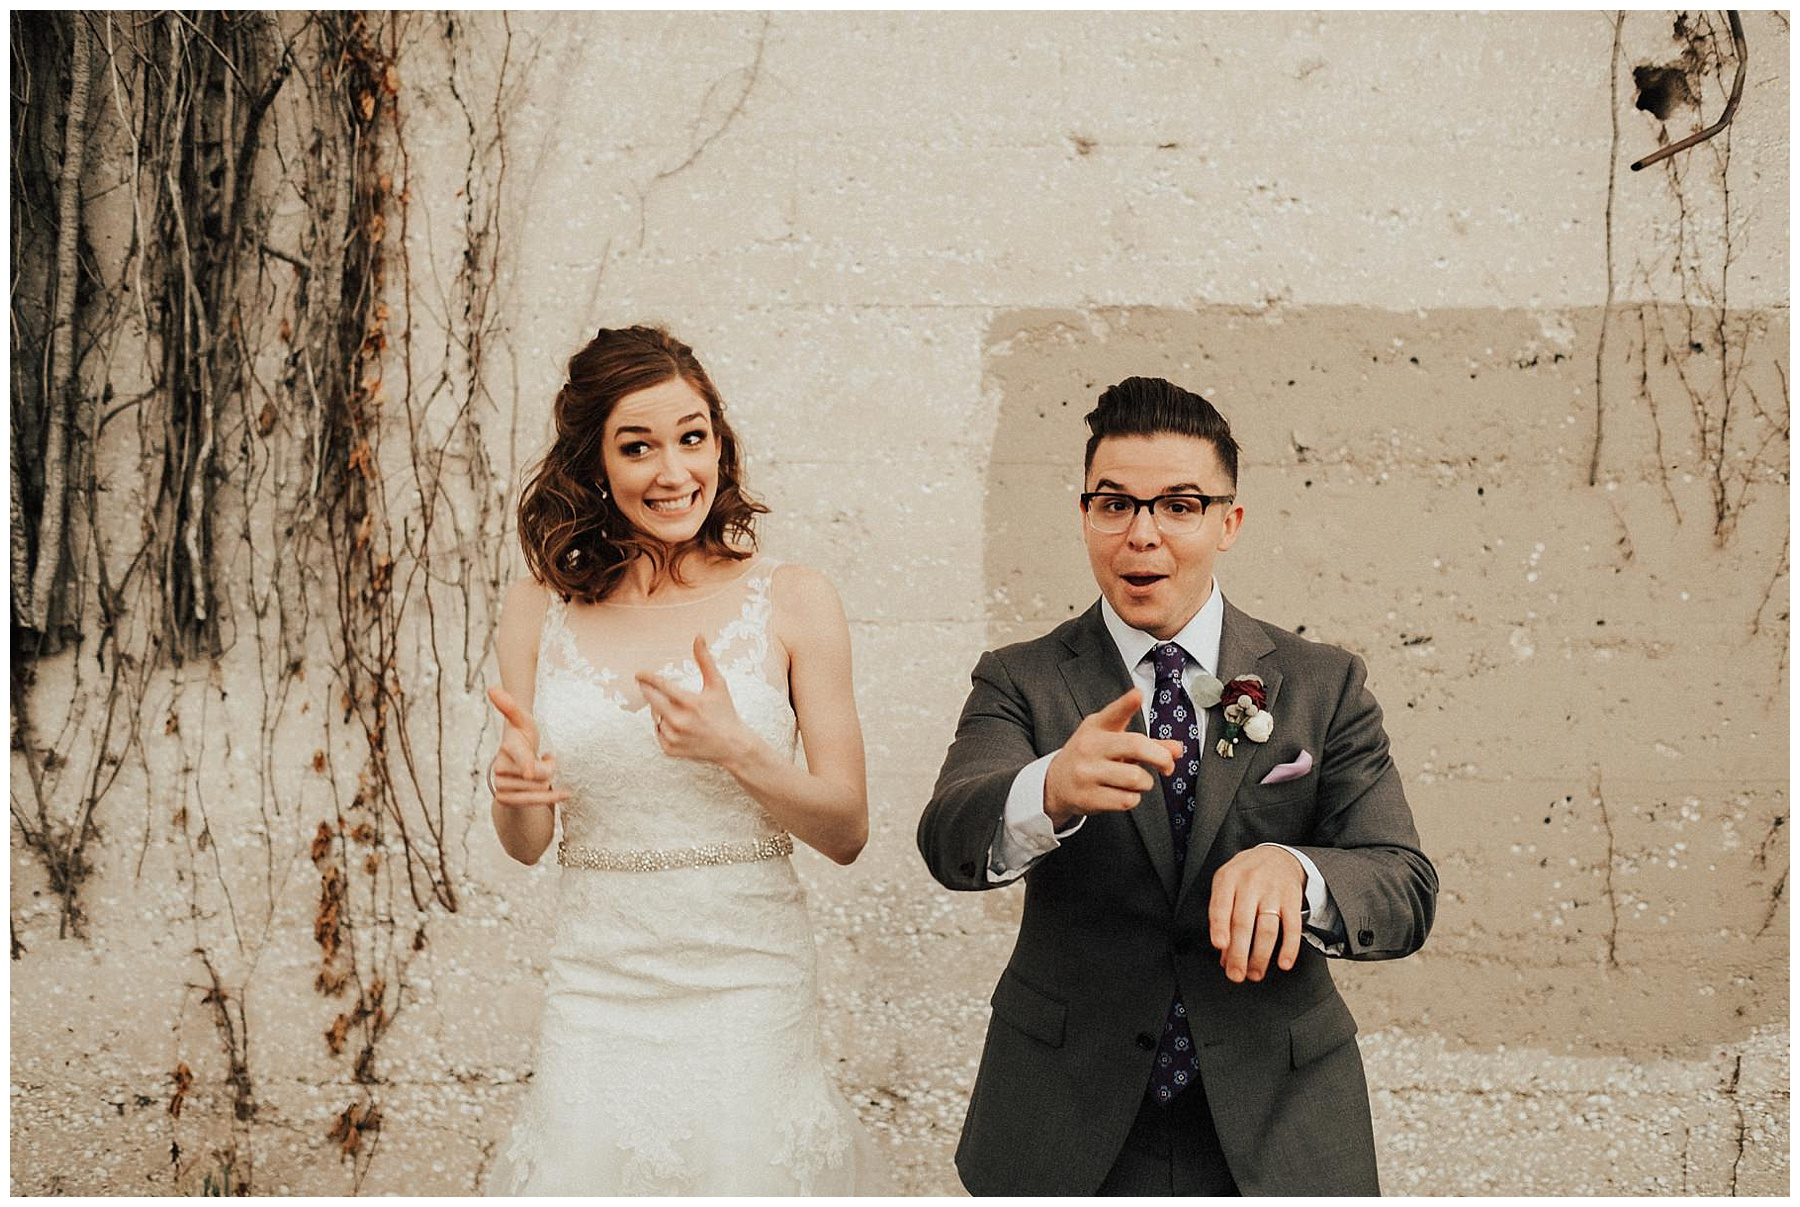 Kylie Garden Wedding Tampa Wedding Photographer-120.jpg